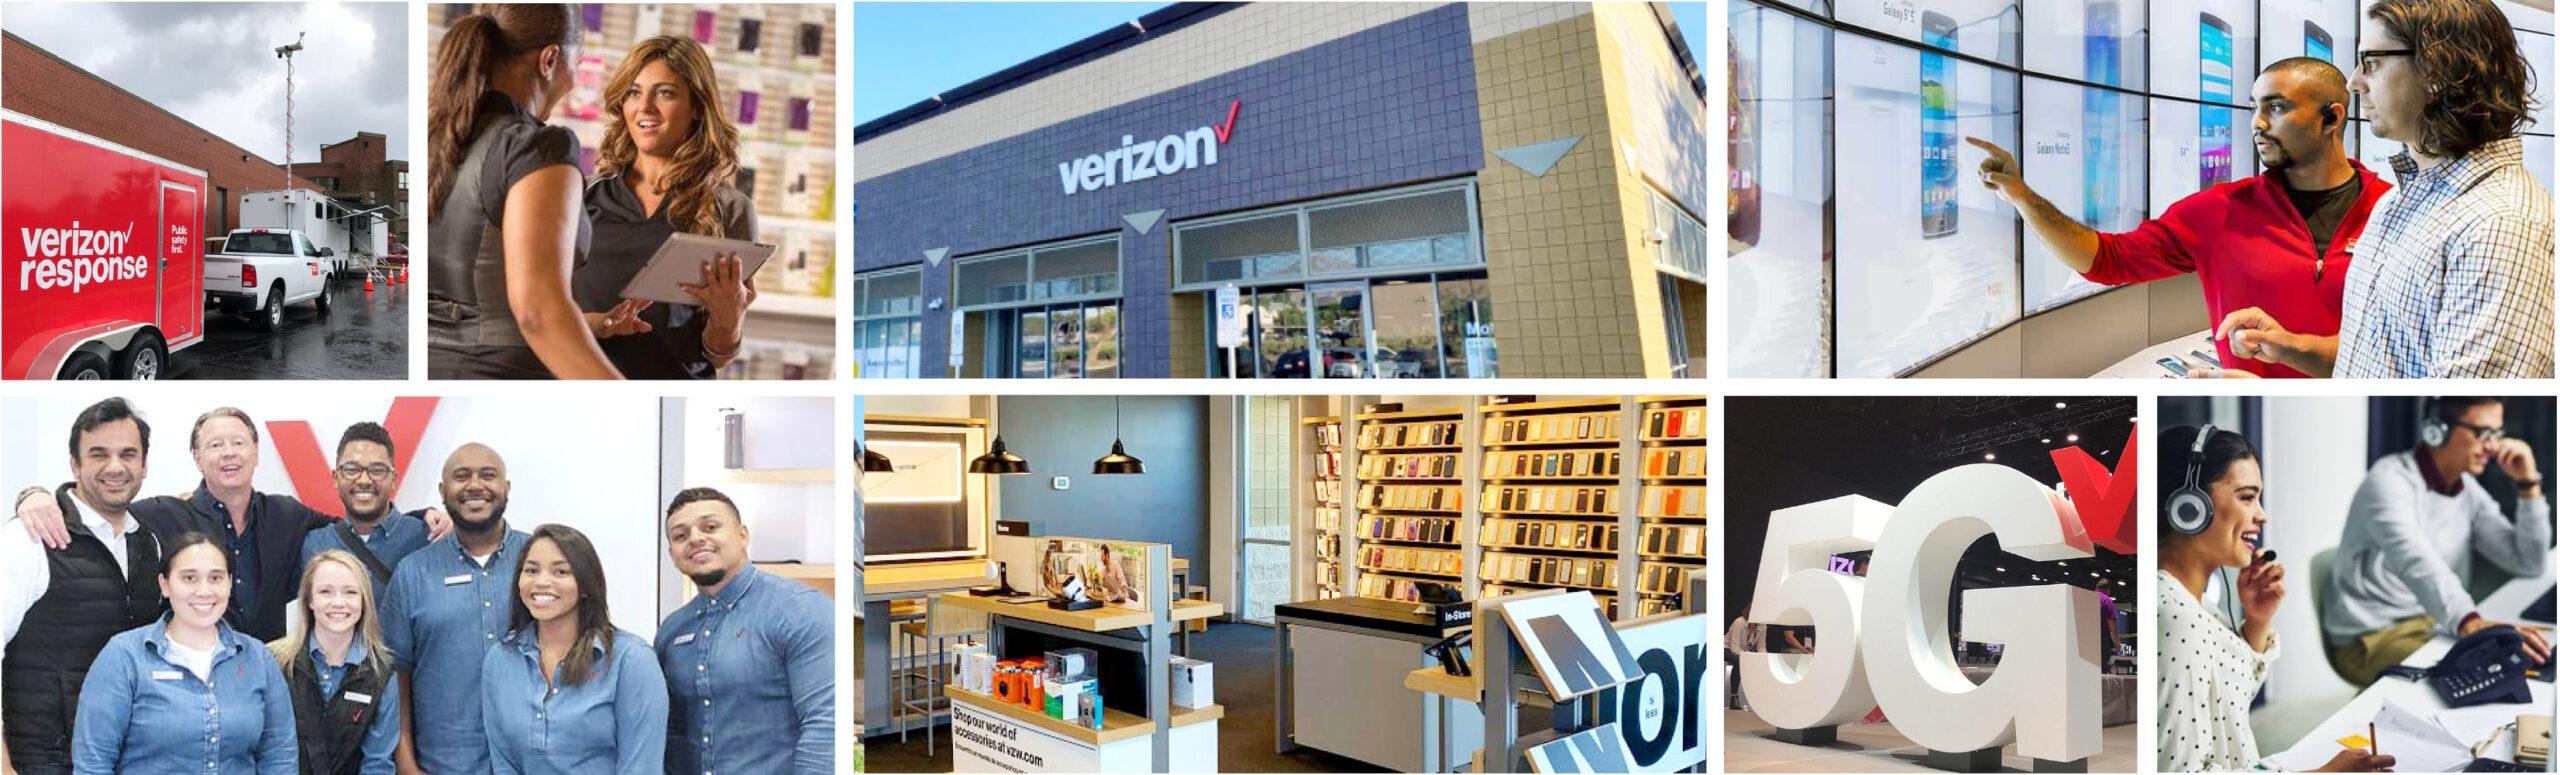 Verizon Store – Arcadia Crossing is one of the best!